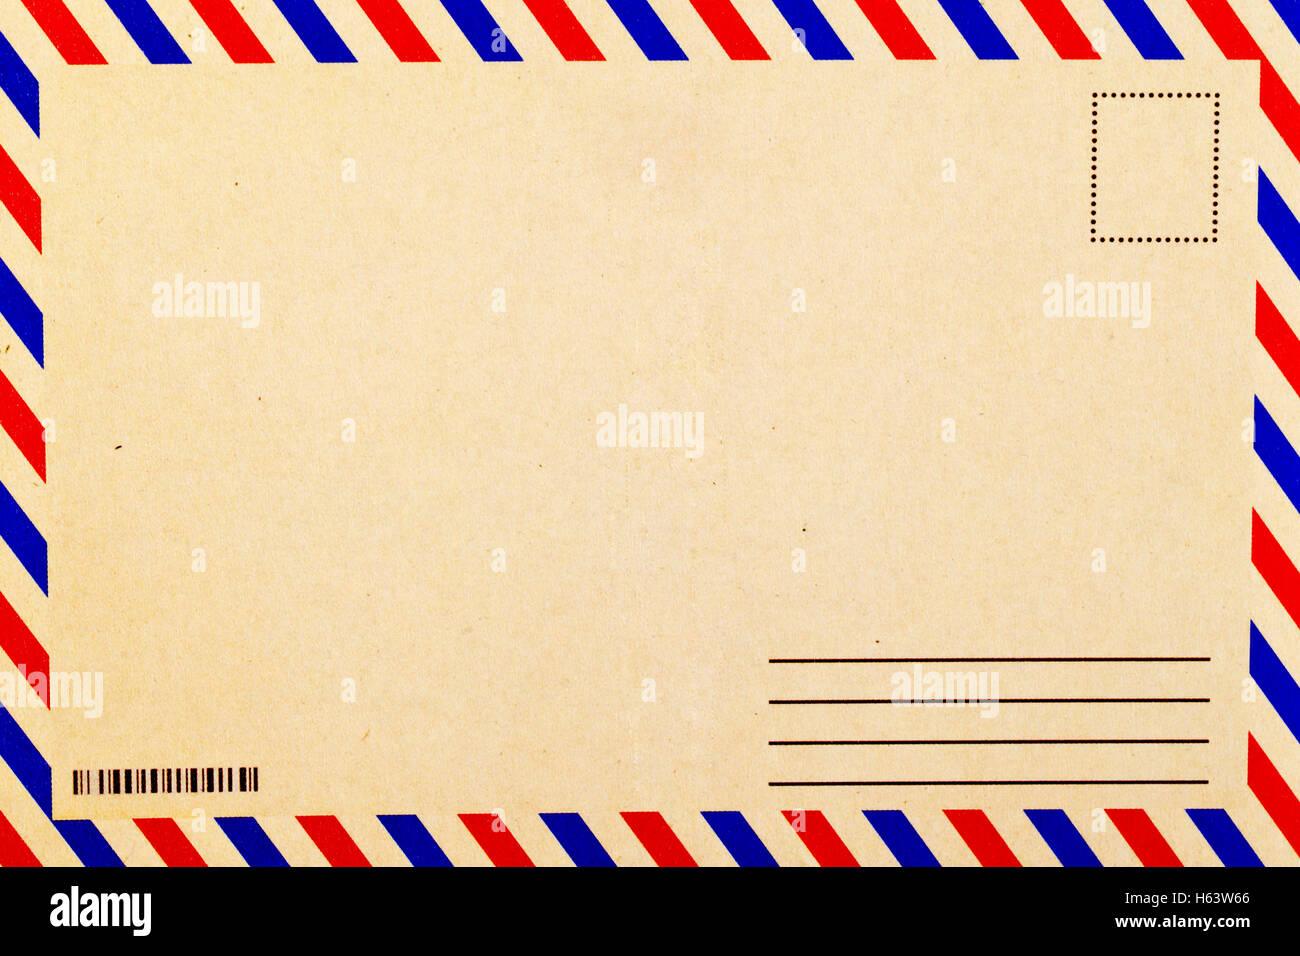 Un fond de carte postale vintage vierge Photo Stock - Alamy